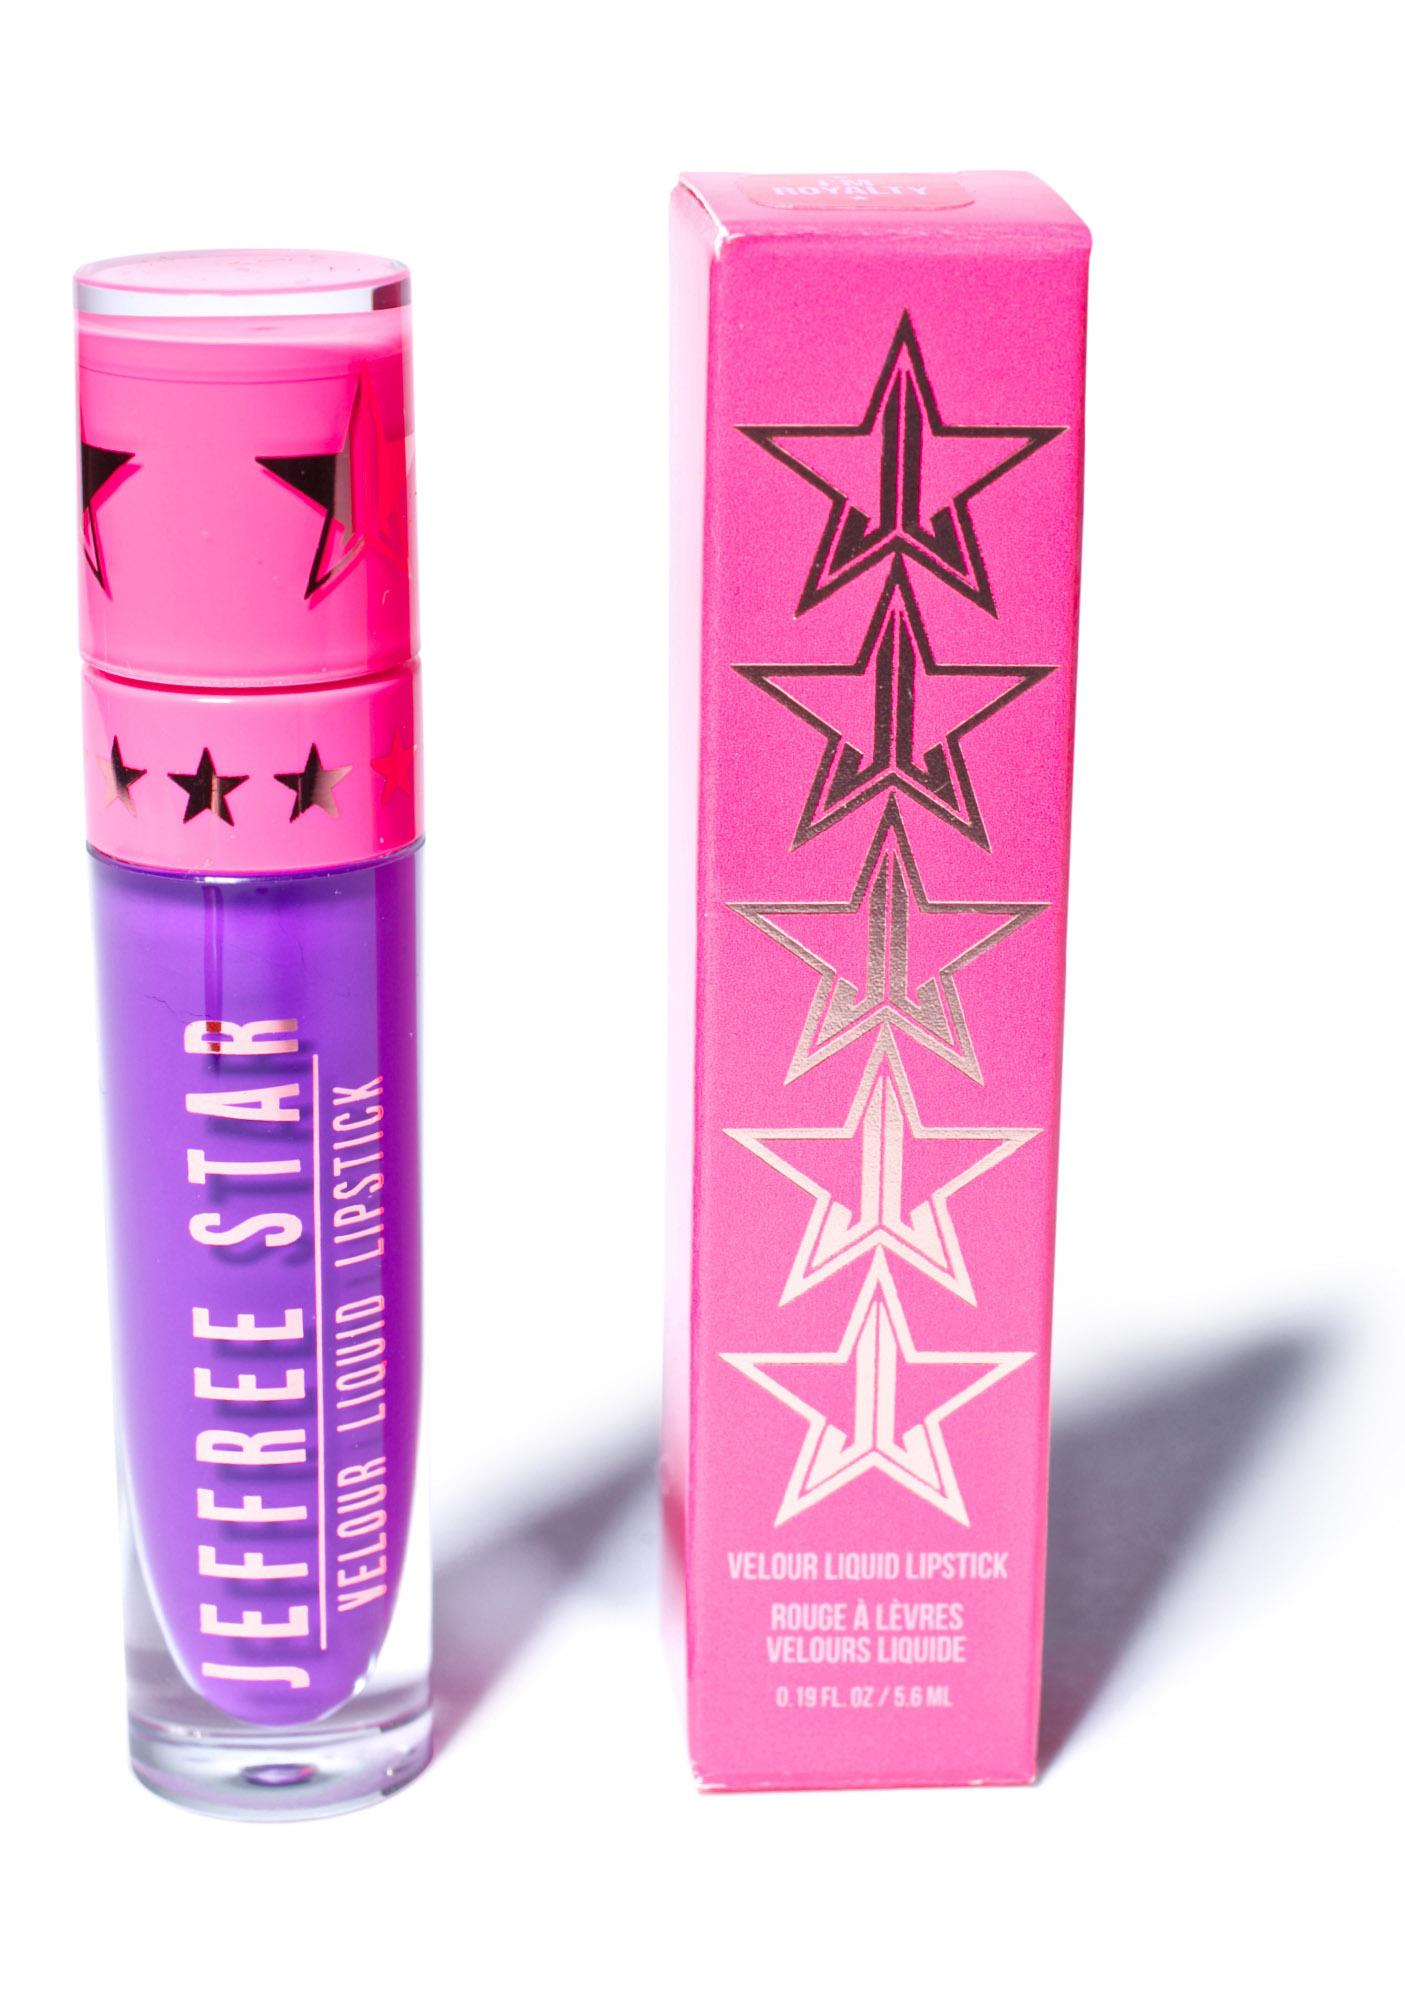 Jeffree Star I'm Royalty Liquid Lipstick